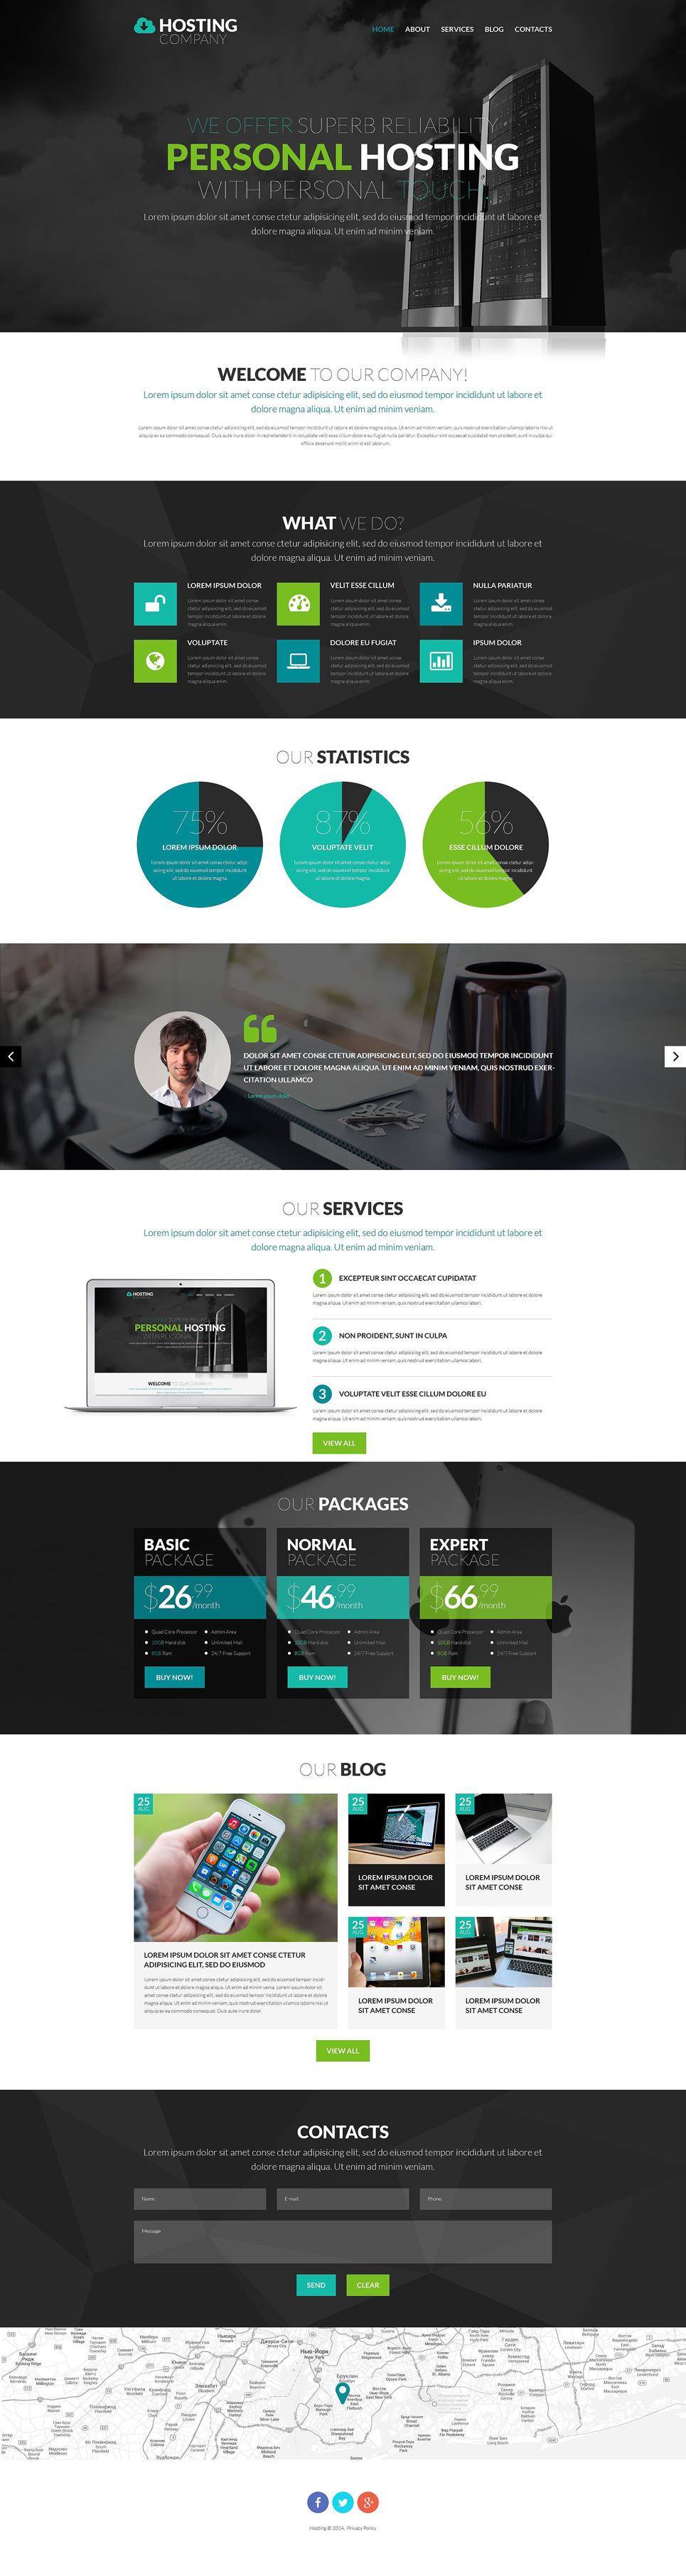 Hosting Company PSD Template New Screenshots BIG